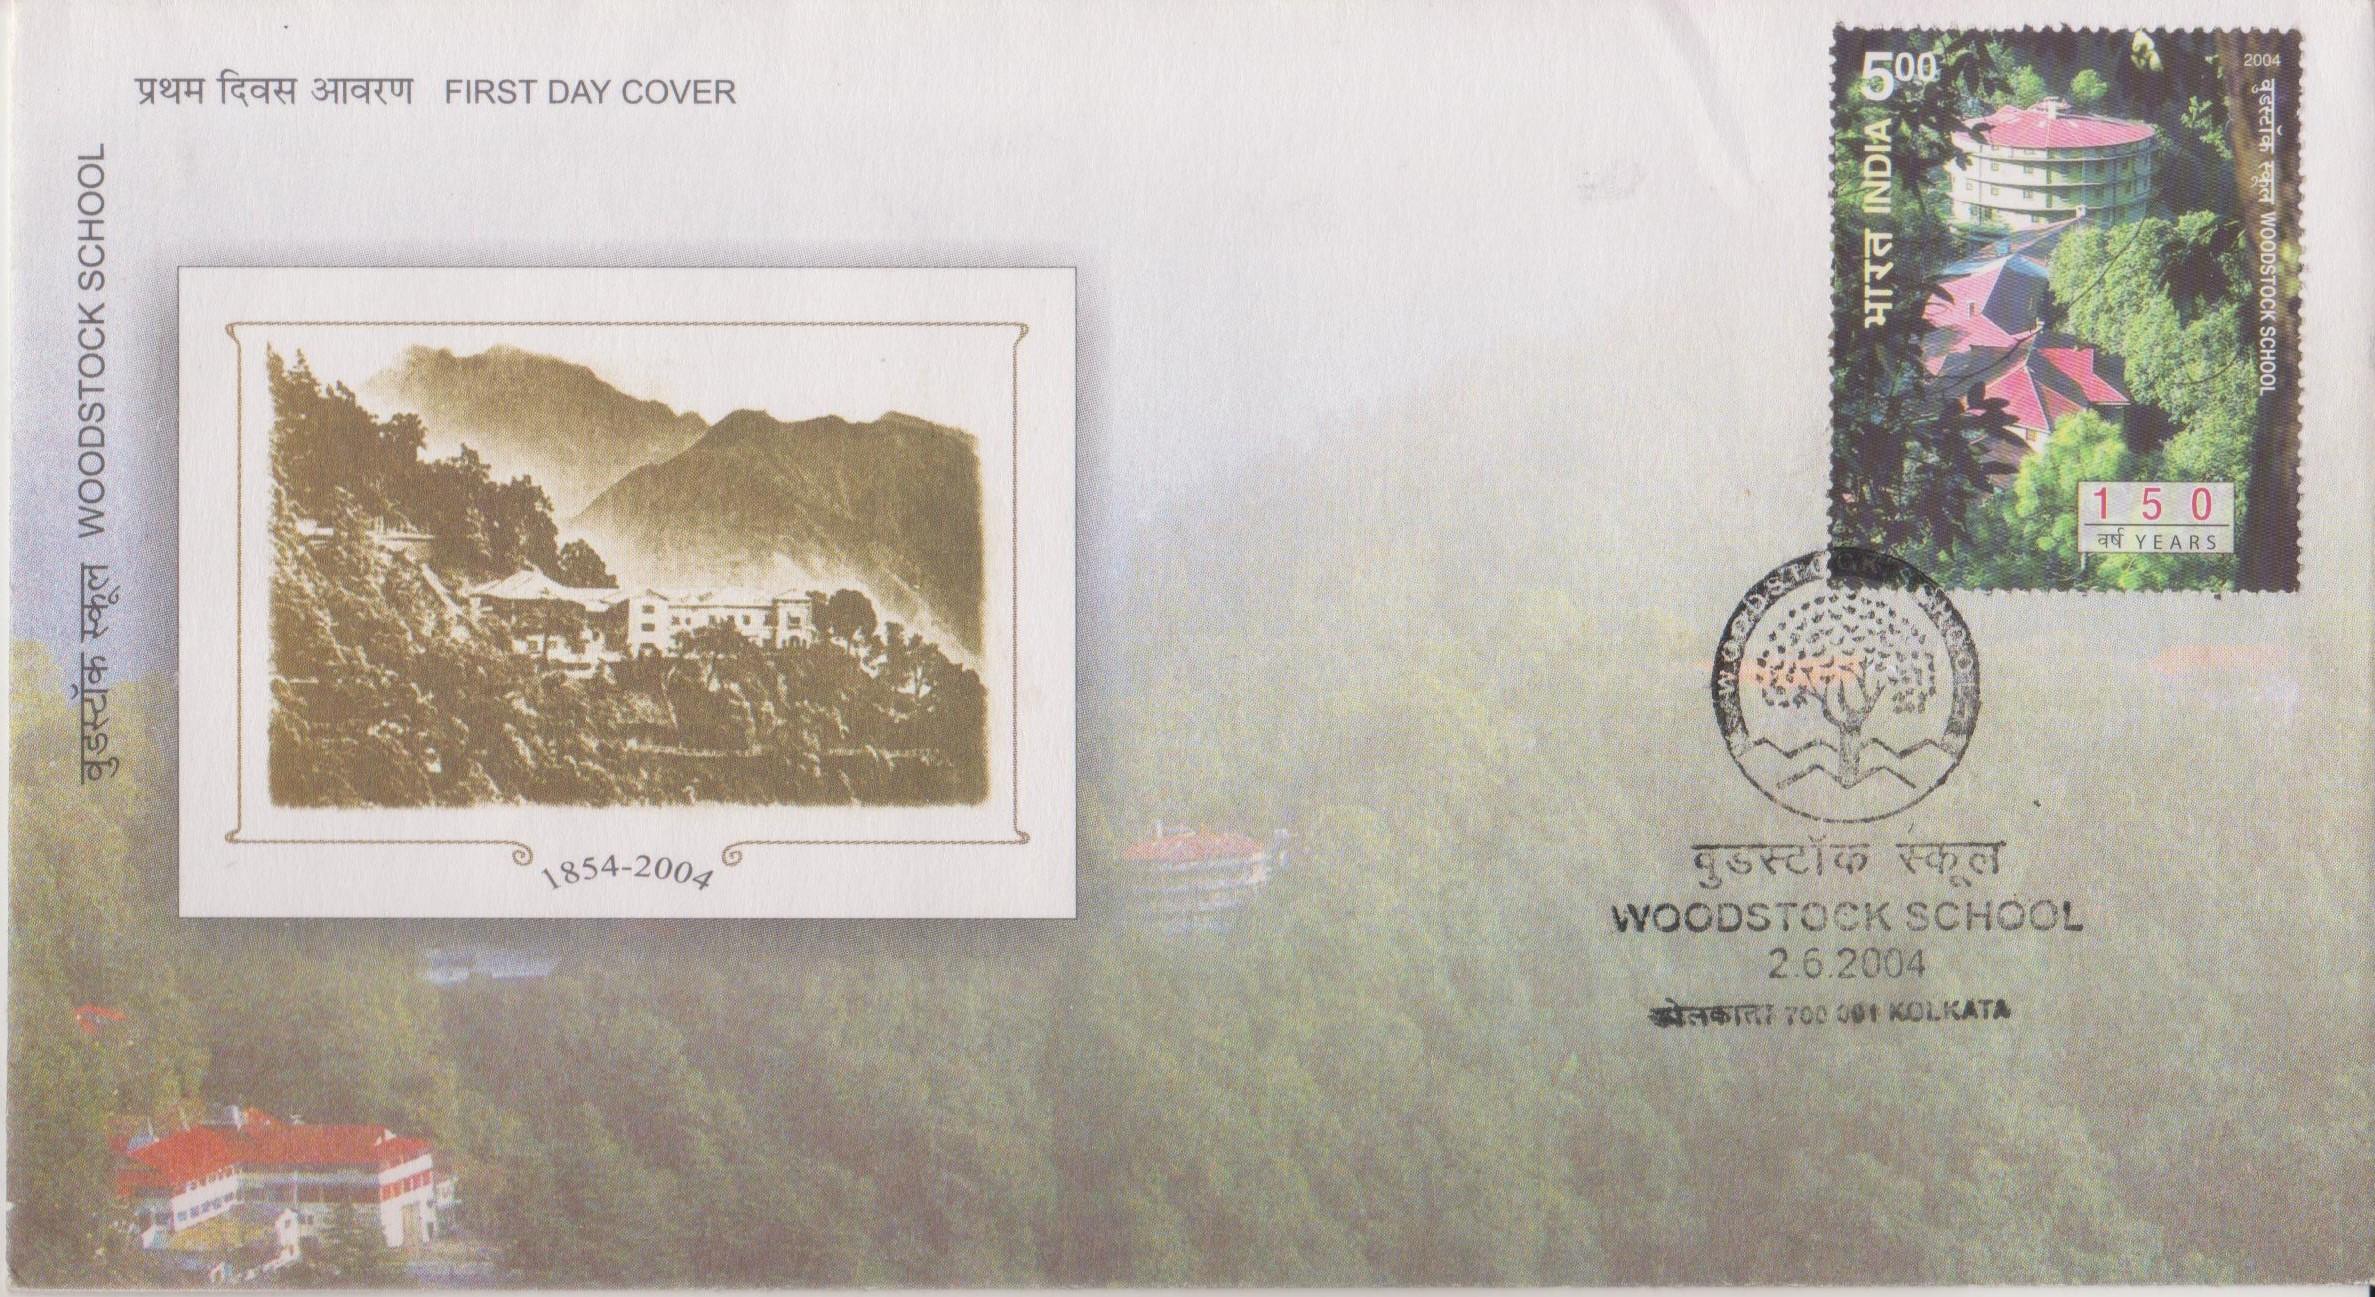 Himalayan forest (Uttarakhand)